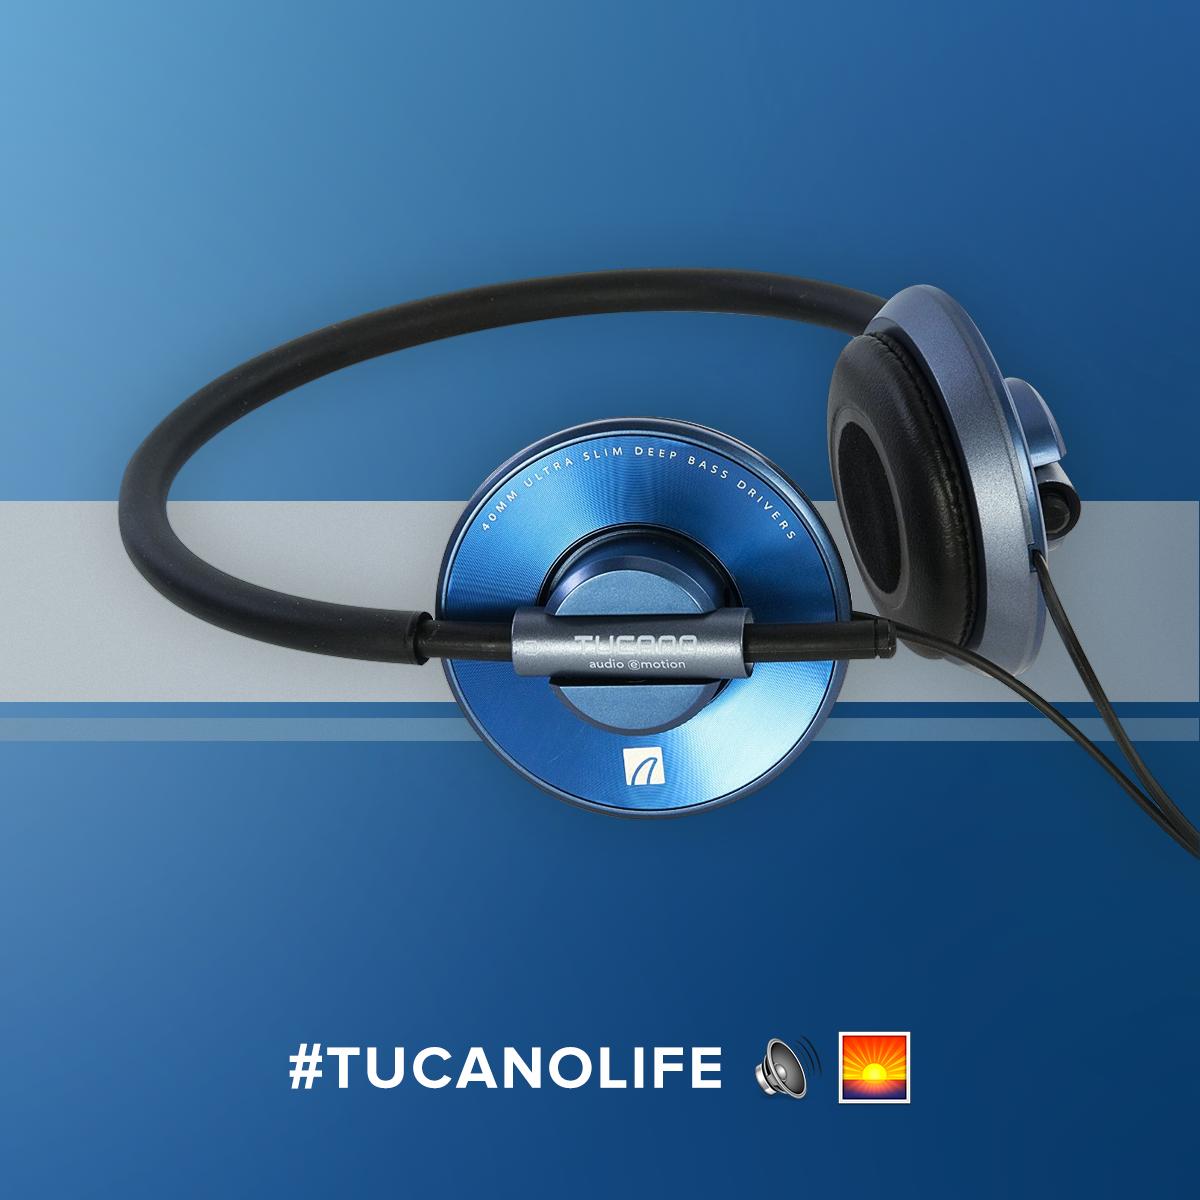 tucano_lug27-02_05